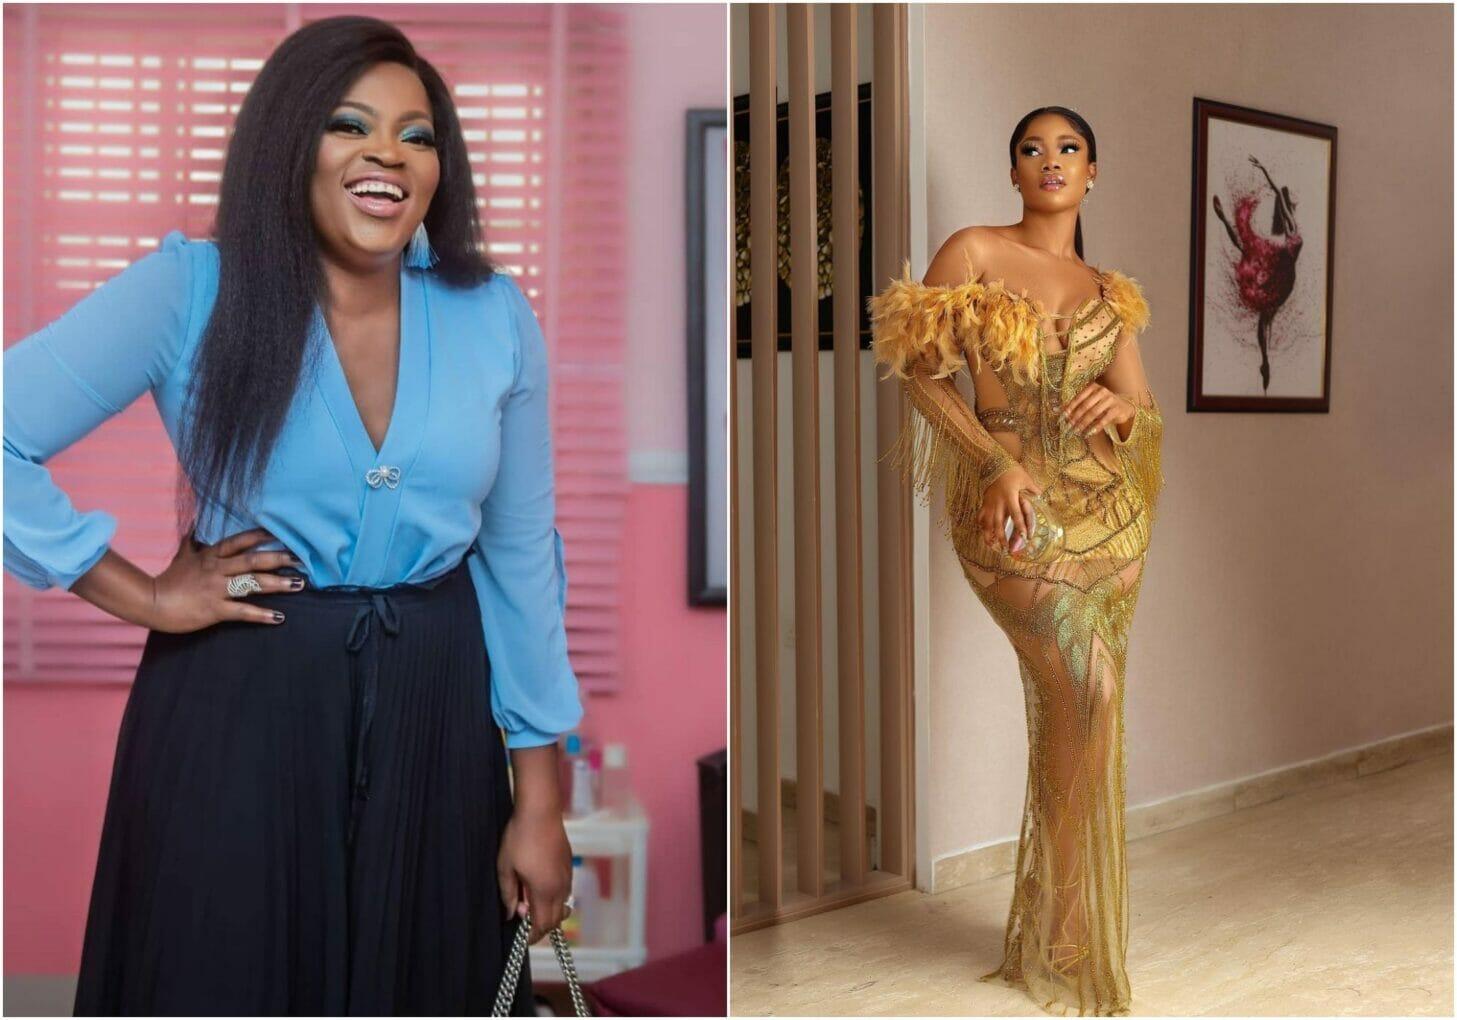 Tacha, others react as Funke Akindele shares a new message on social media